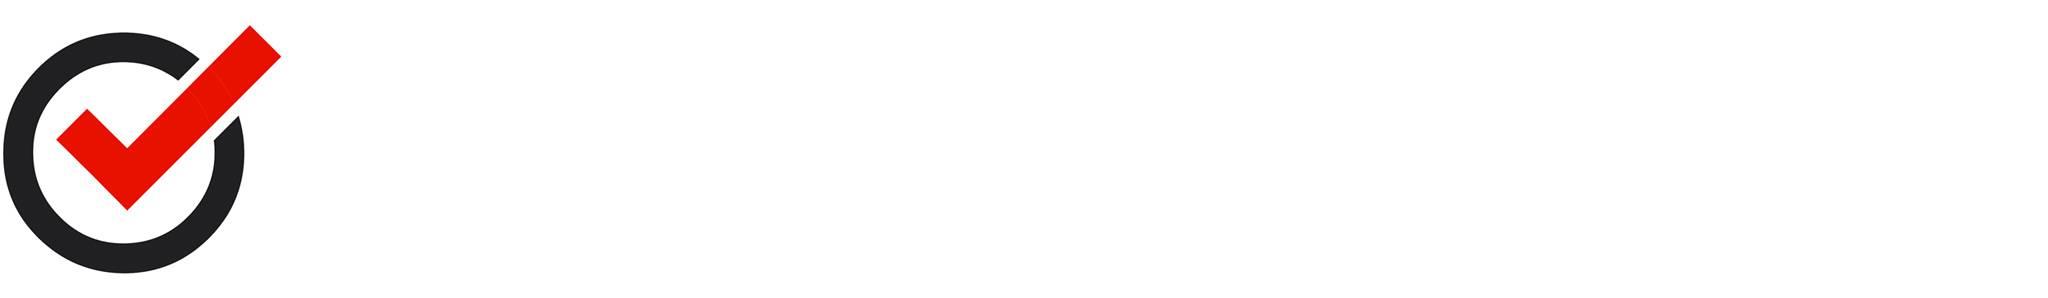 methodologie-logo-bandeau